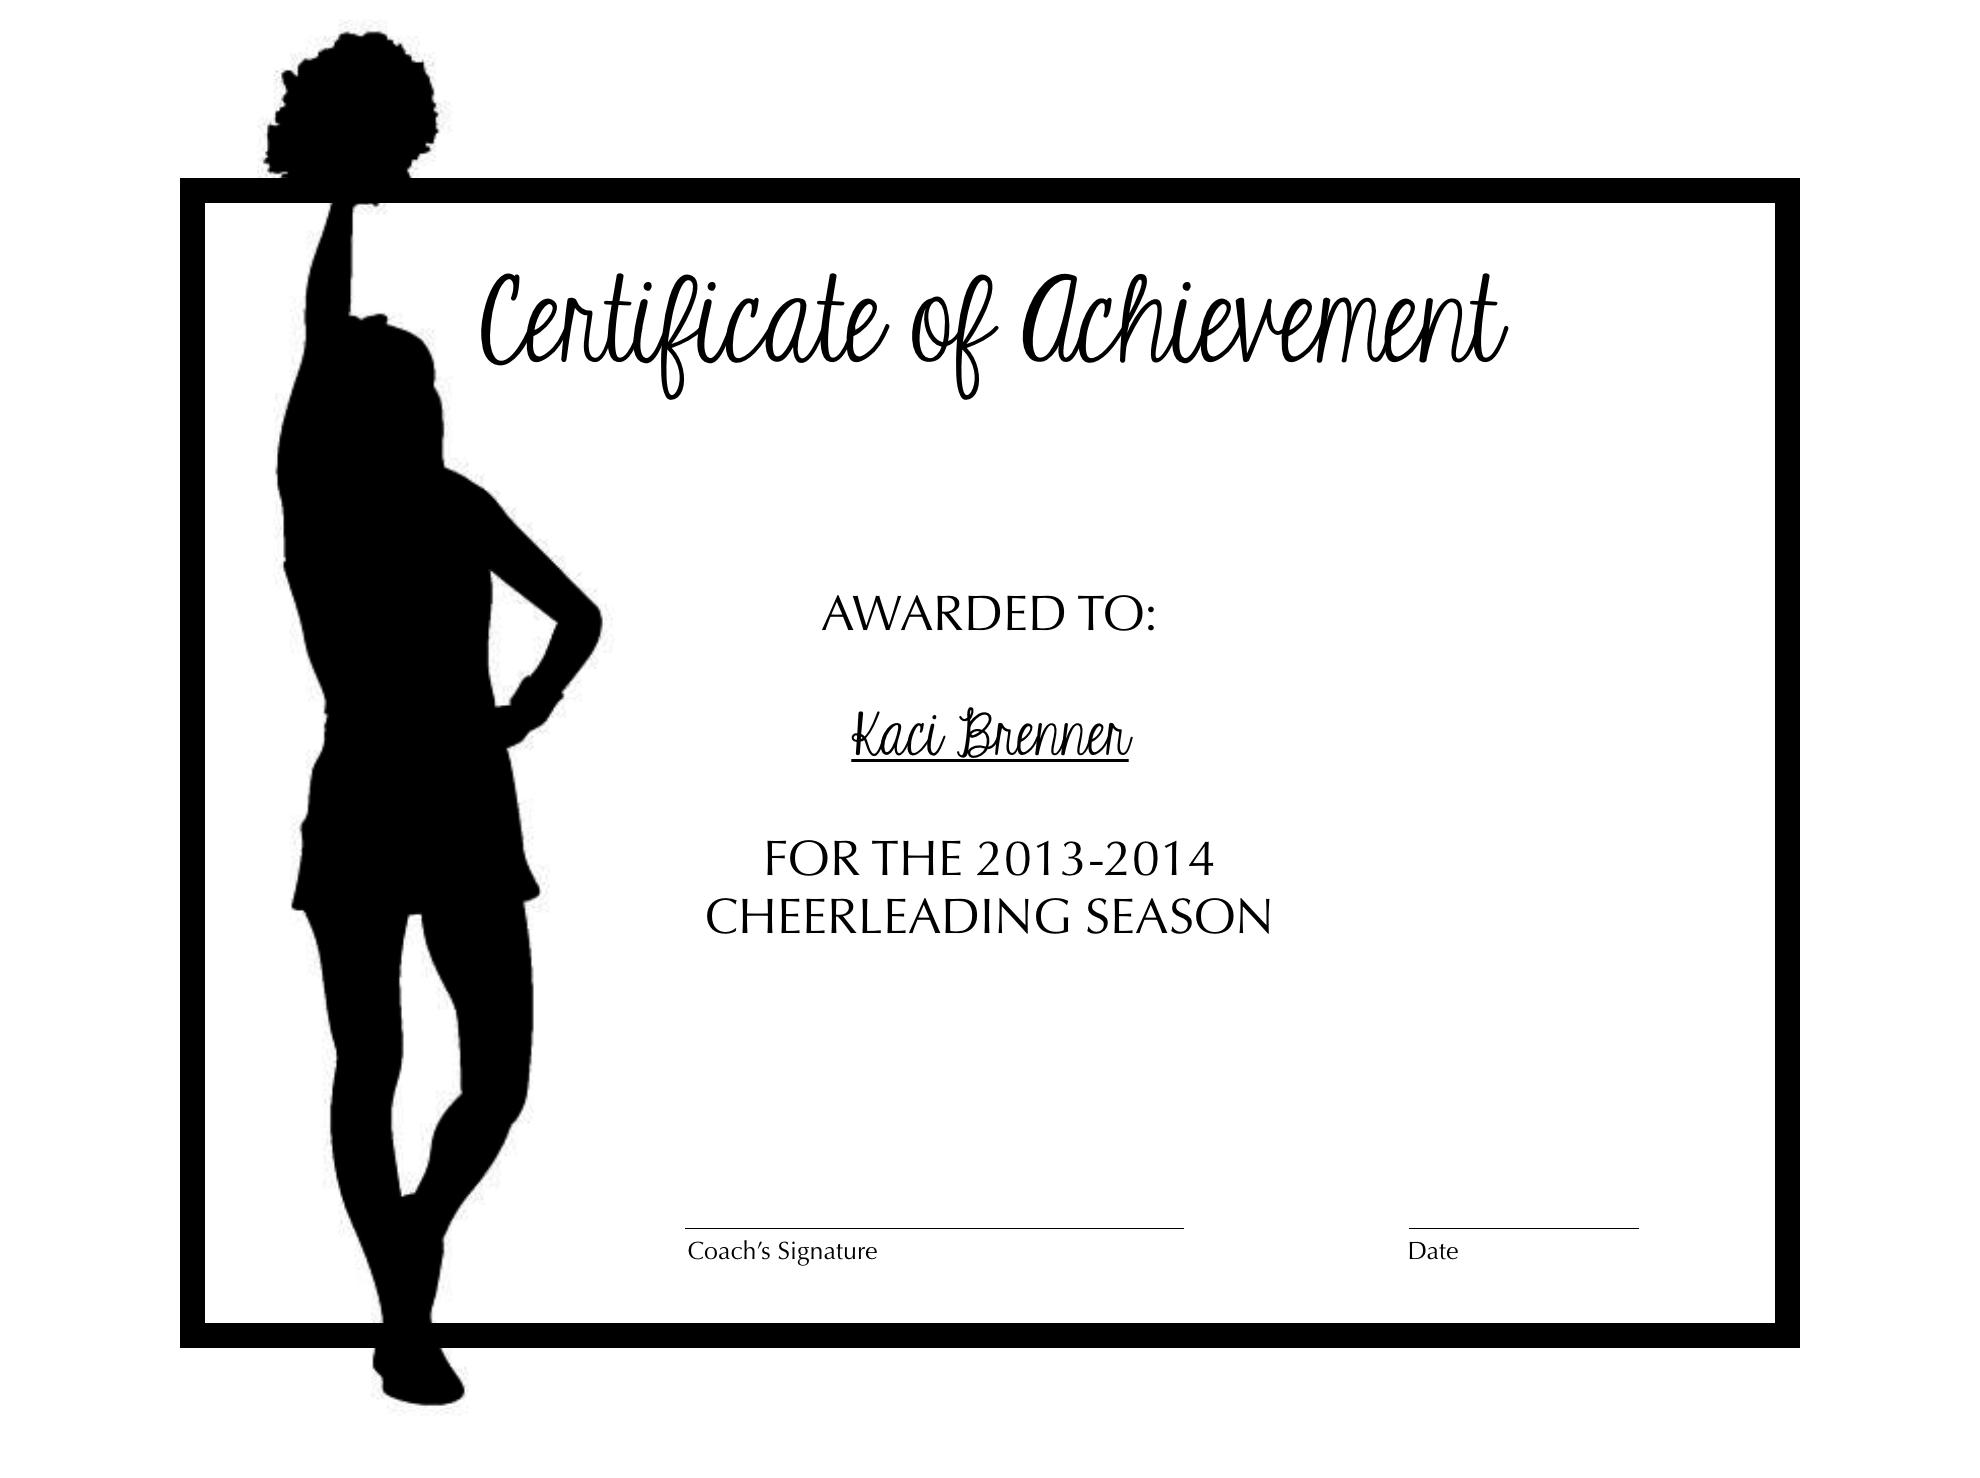 Cheerleading certificate of achievement cheer pinterest cheer cheerleading and cheer coaches for Cheerleading templates printable